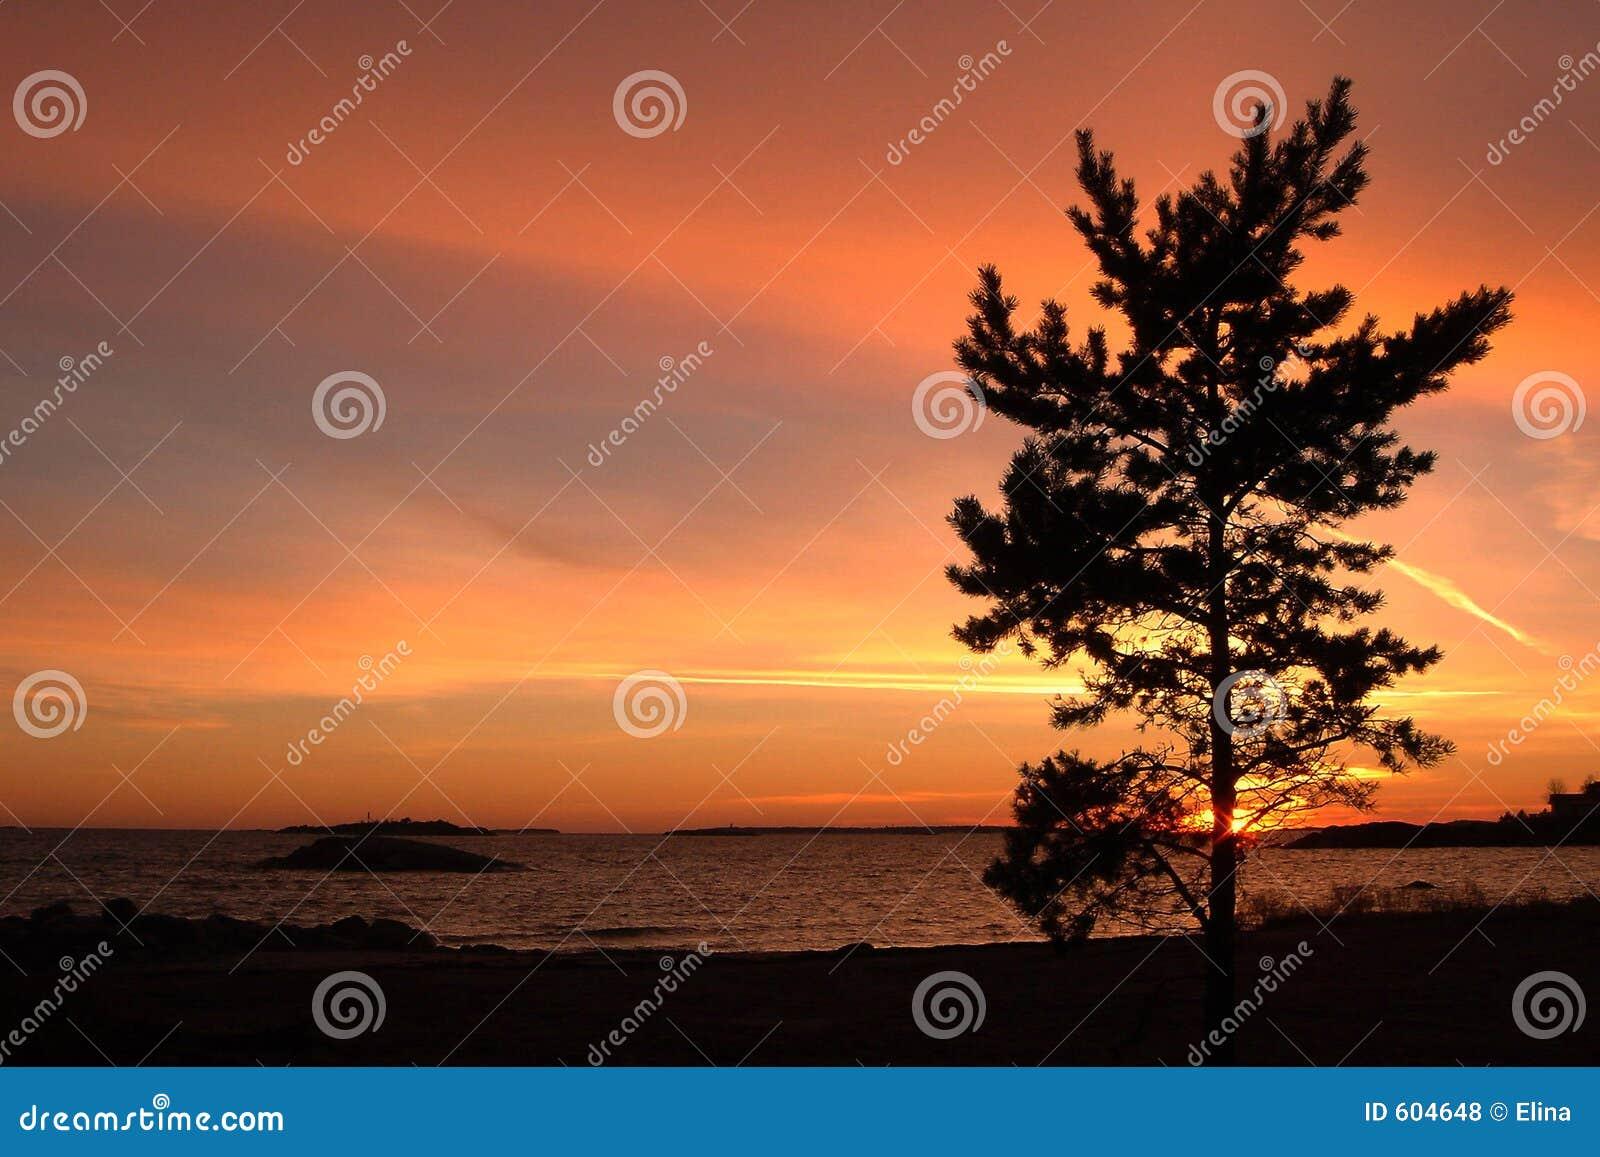 Zonsondergang op Golf van Finland